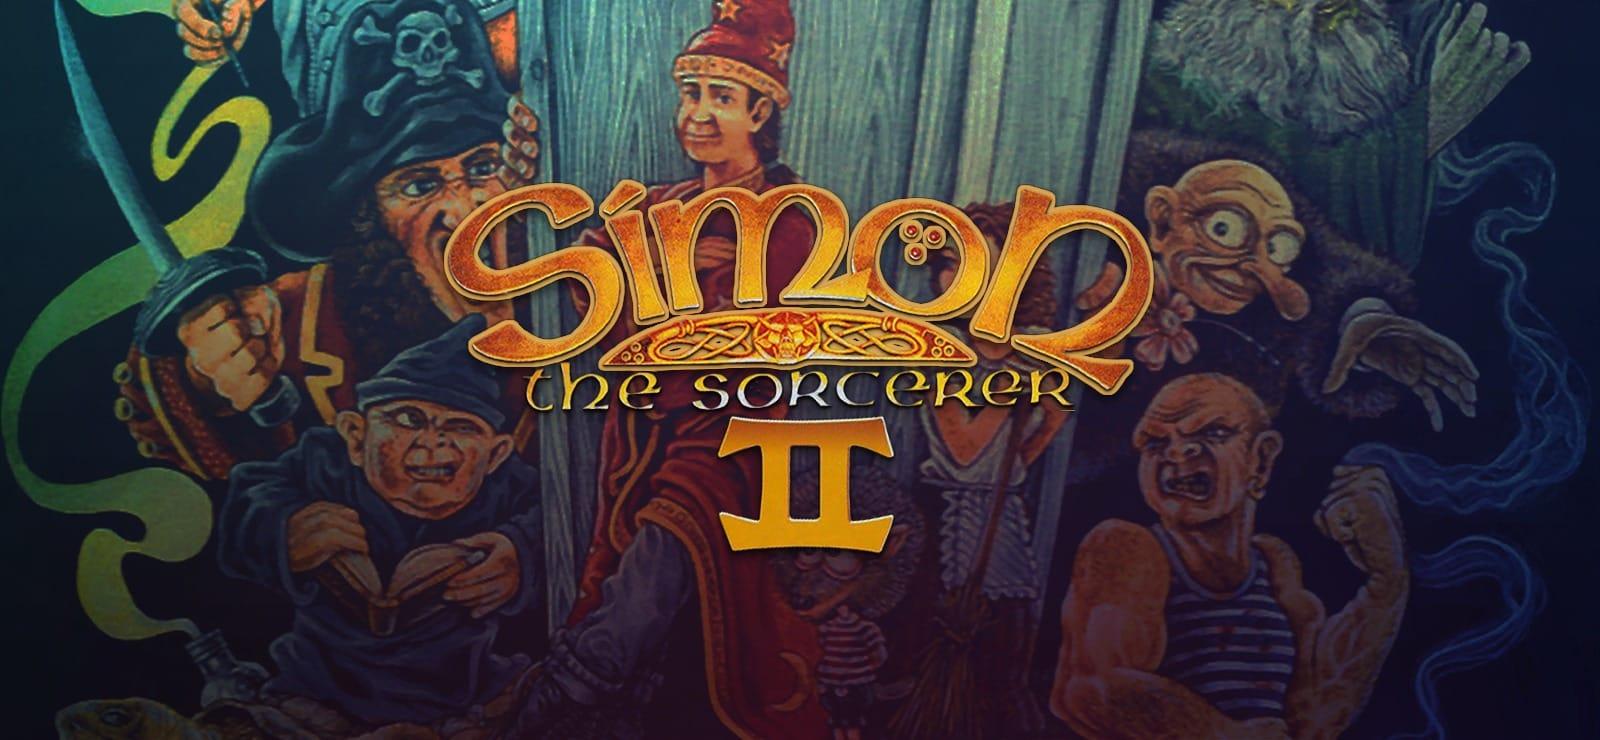 Simon The Sorcerer 2